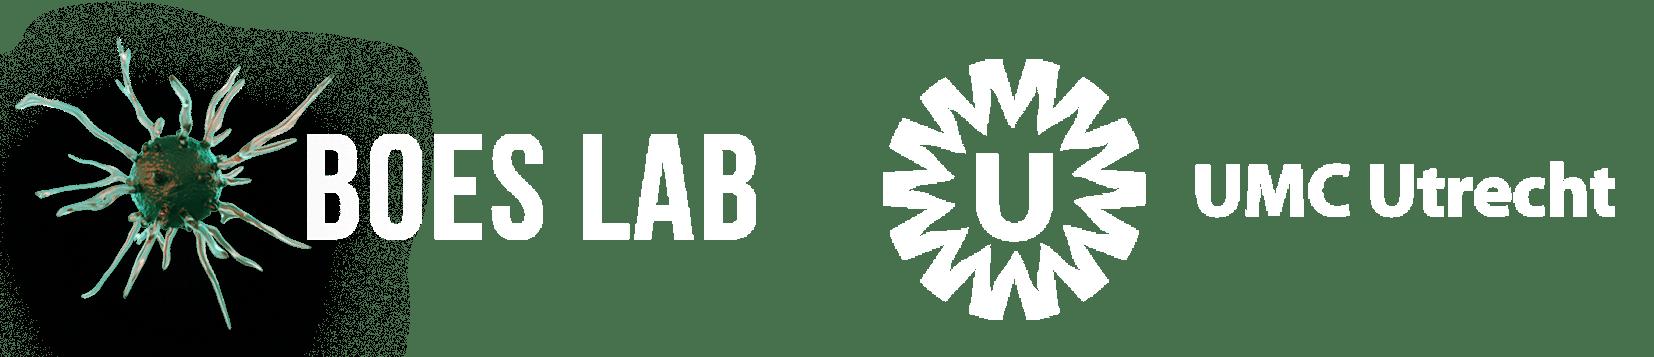 Boes Lab